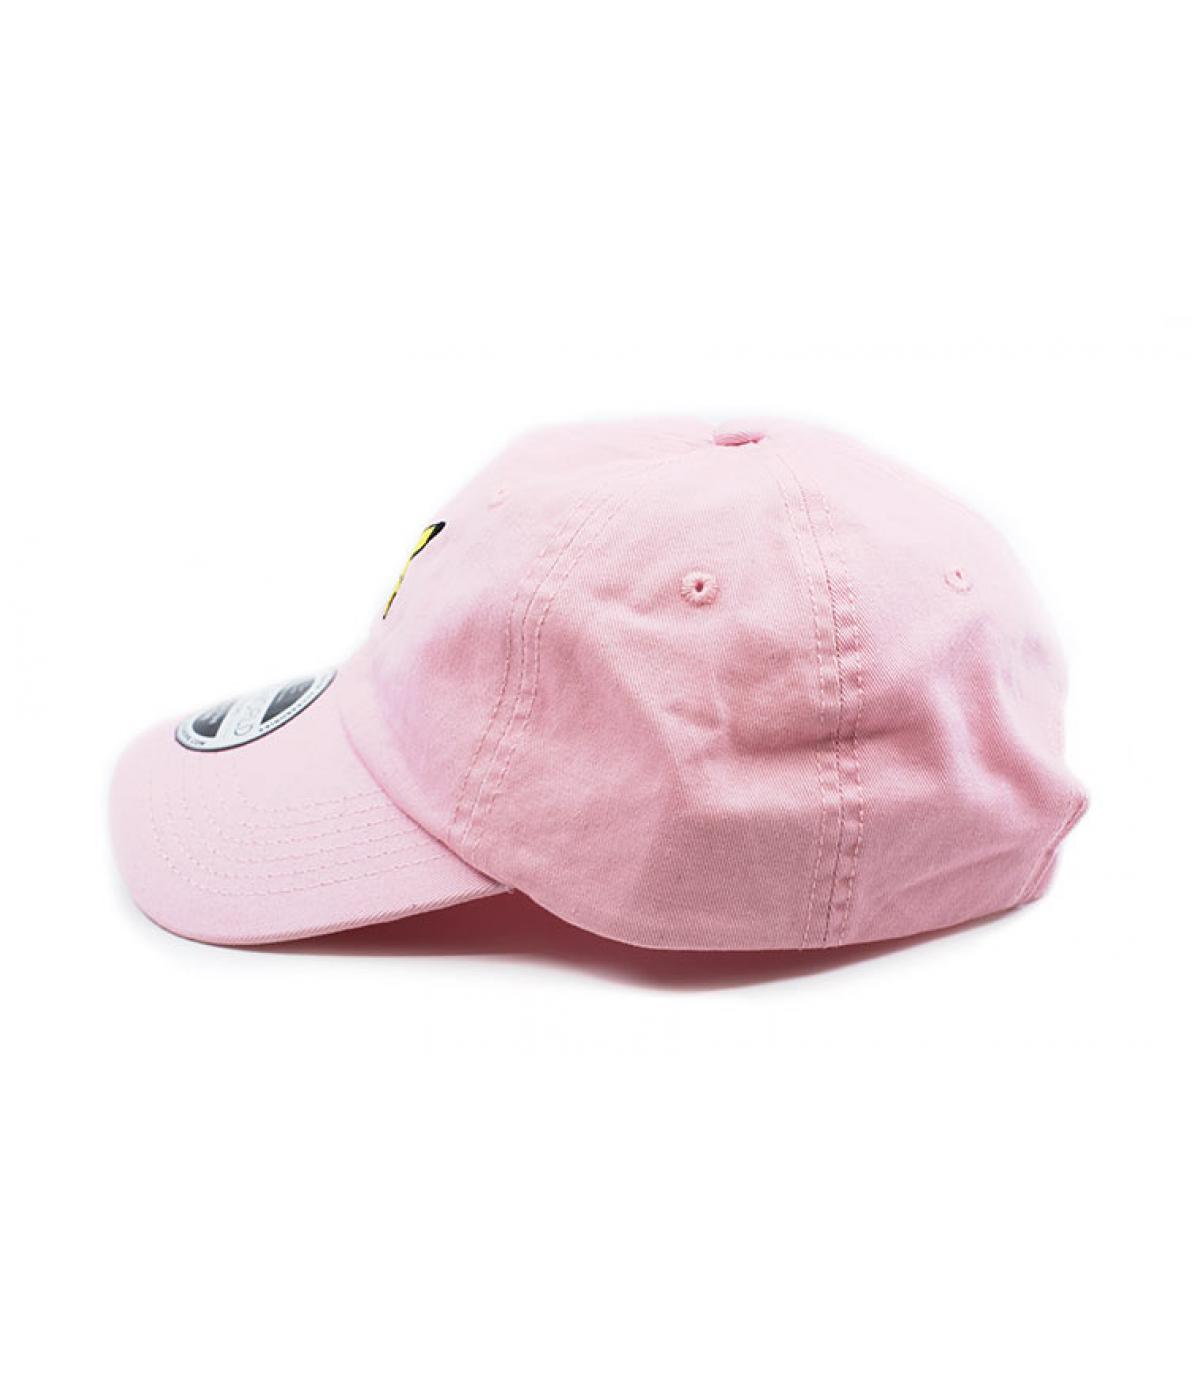 Detalles Pikachu Dad Hat pink imagen 4